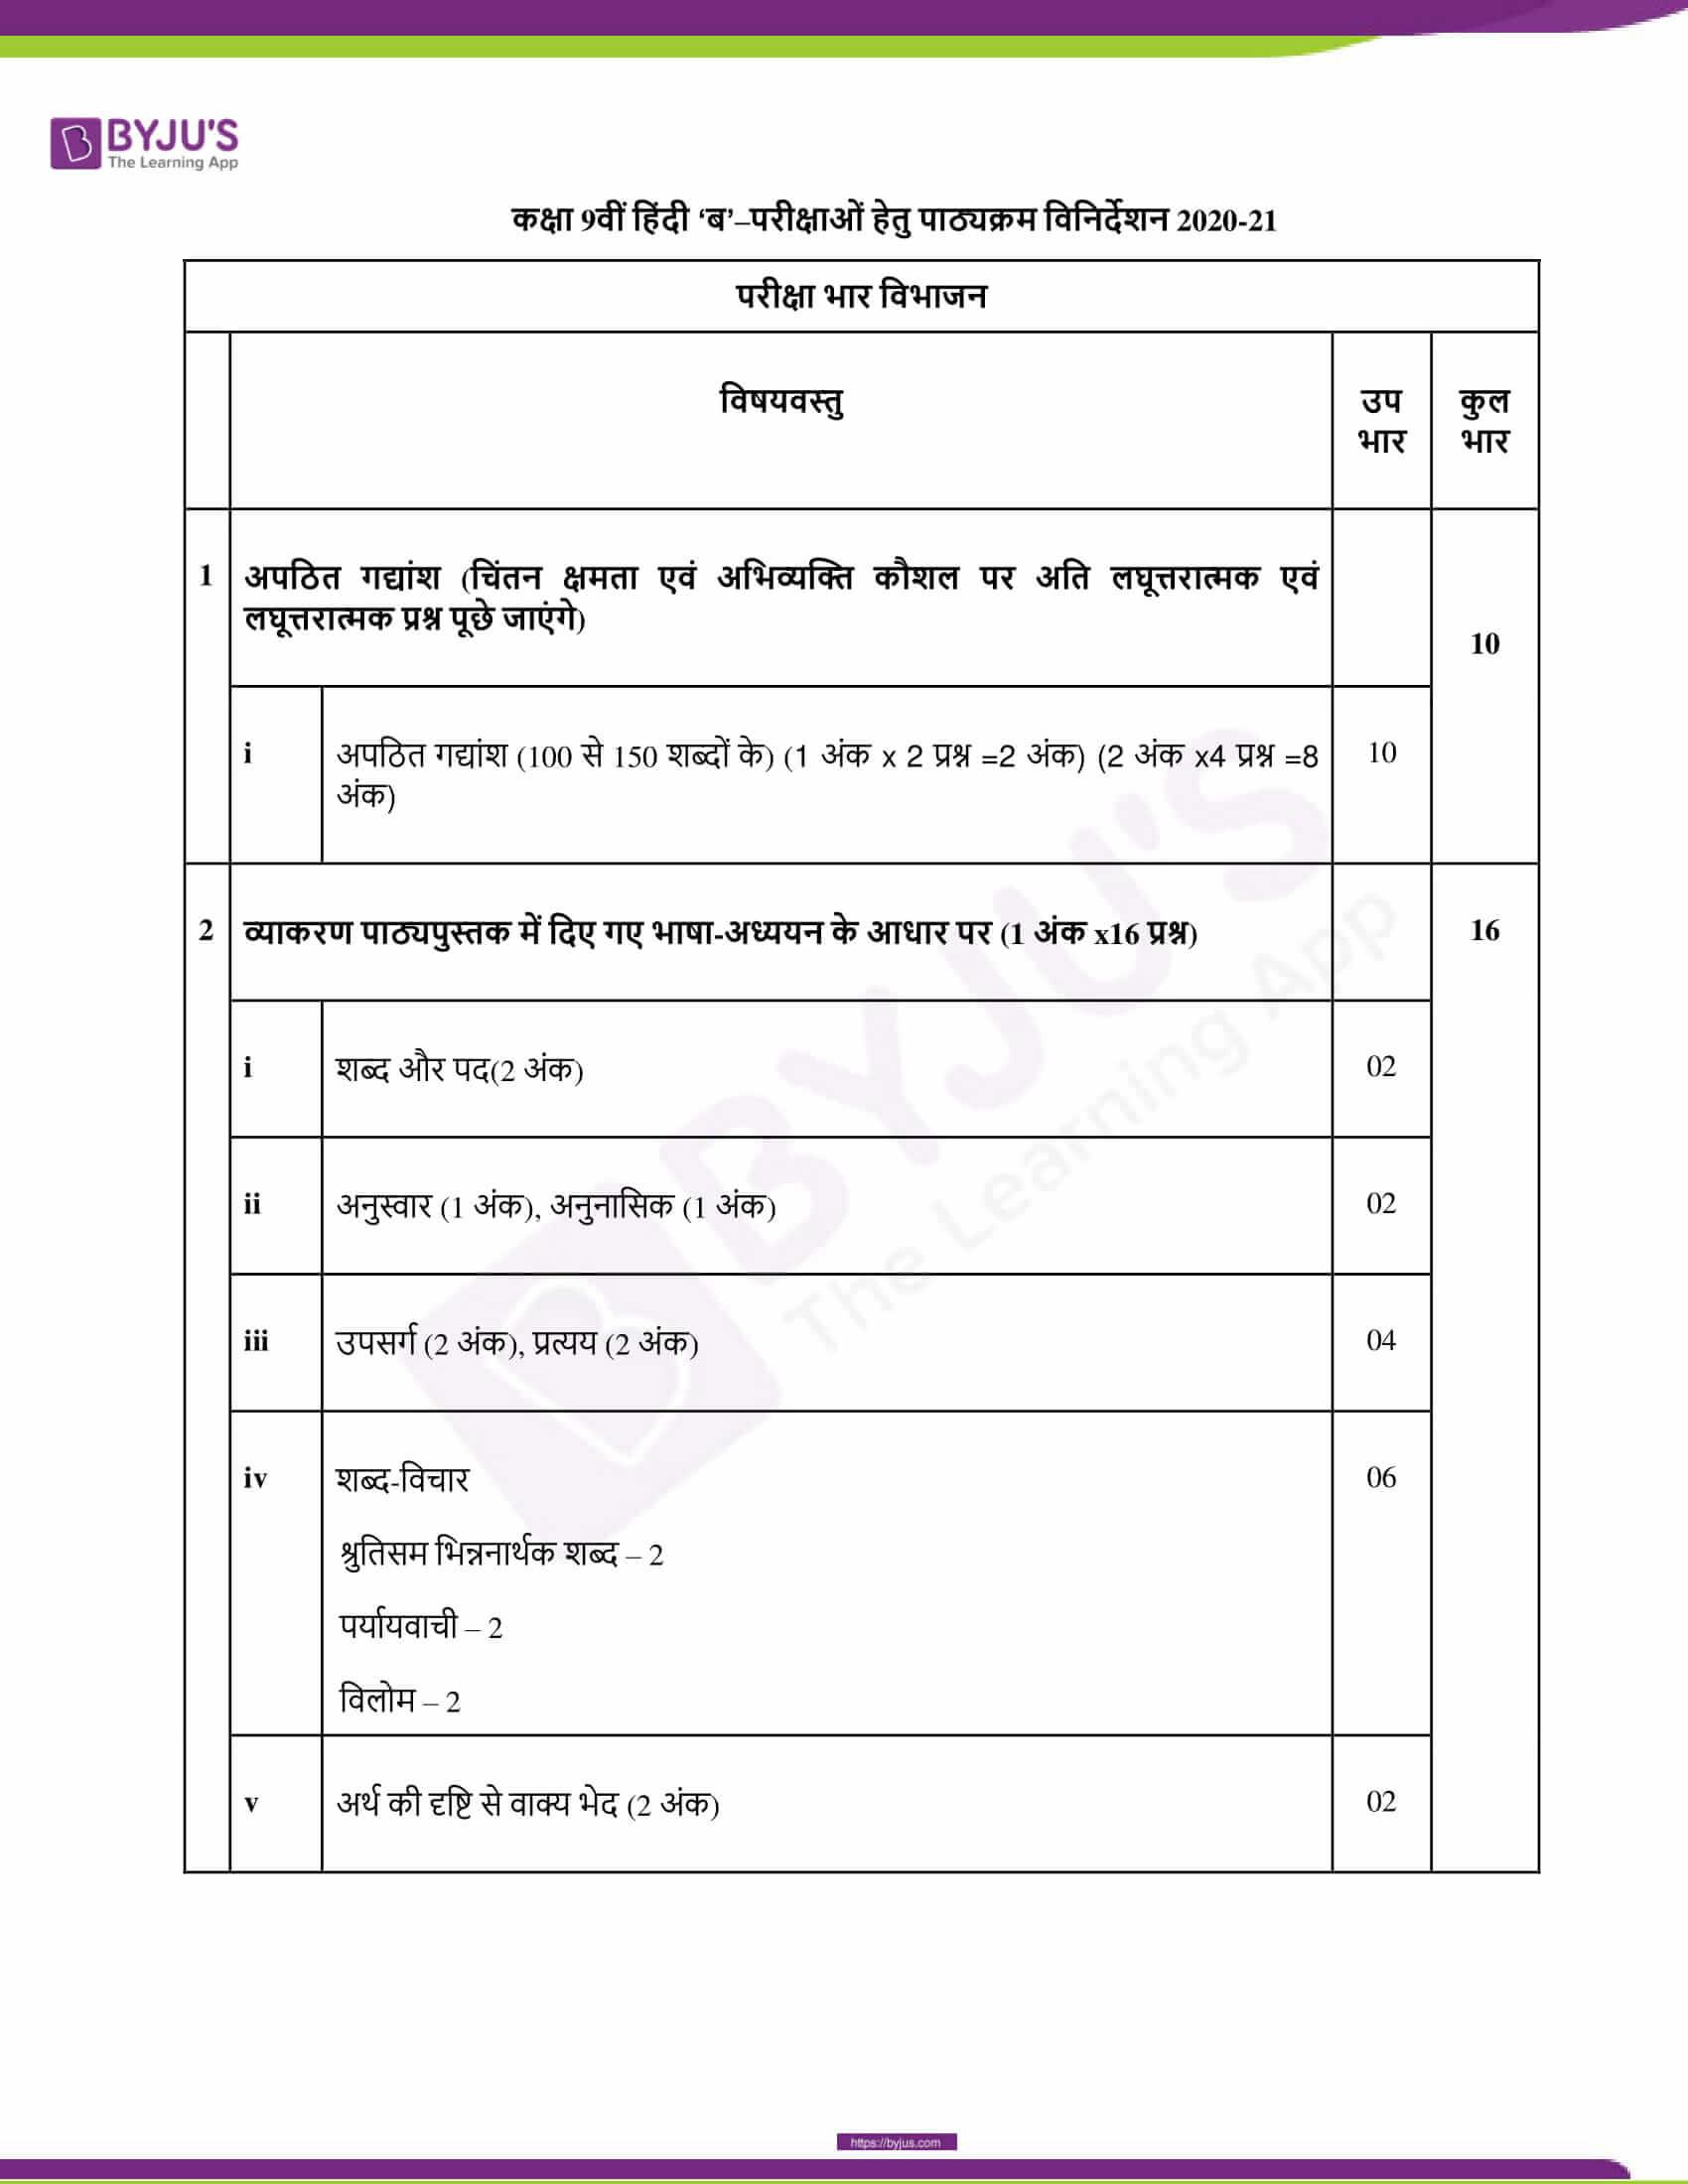 CBSE Class 10 Hindi Course B Revised Syllabus 2020 21 08